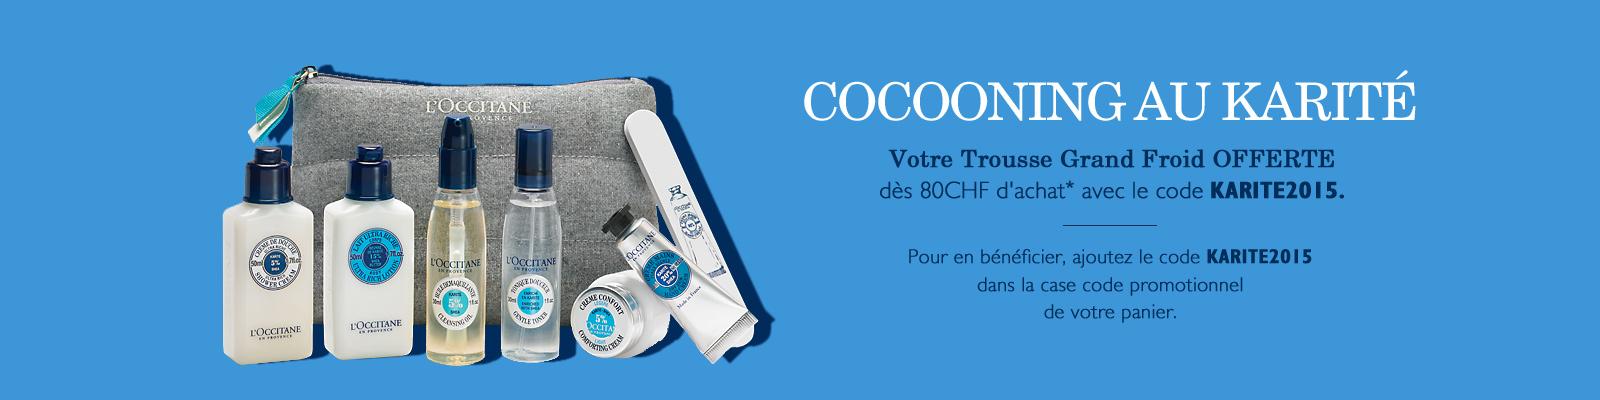 Offre Cocooning au Karité